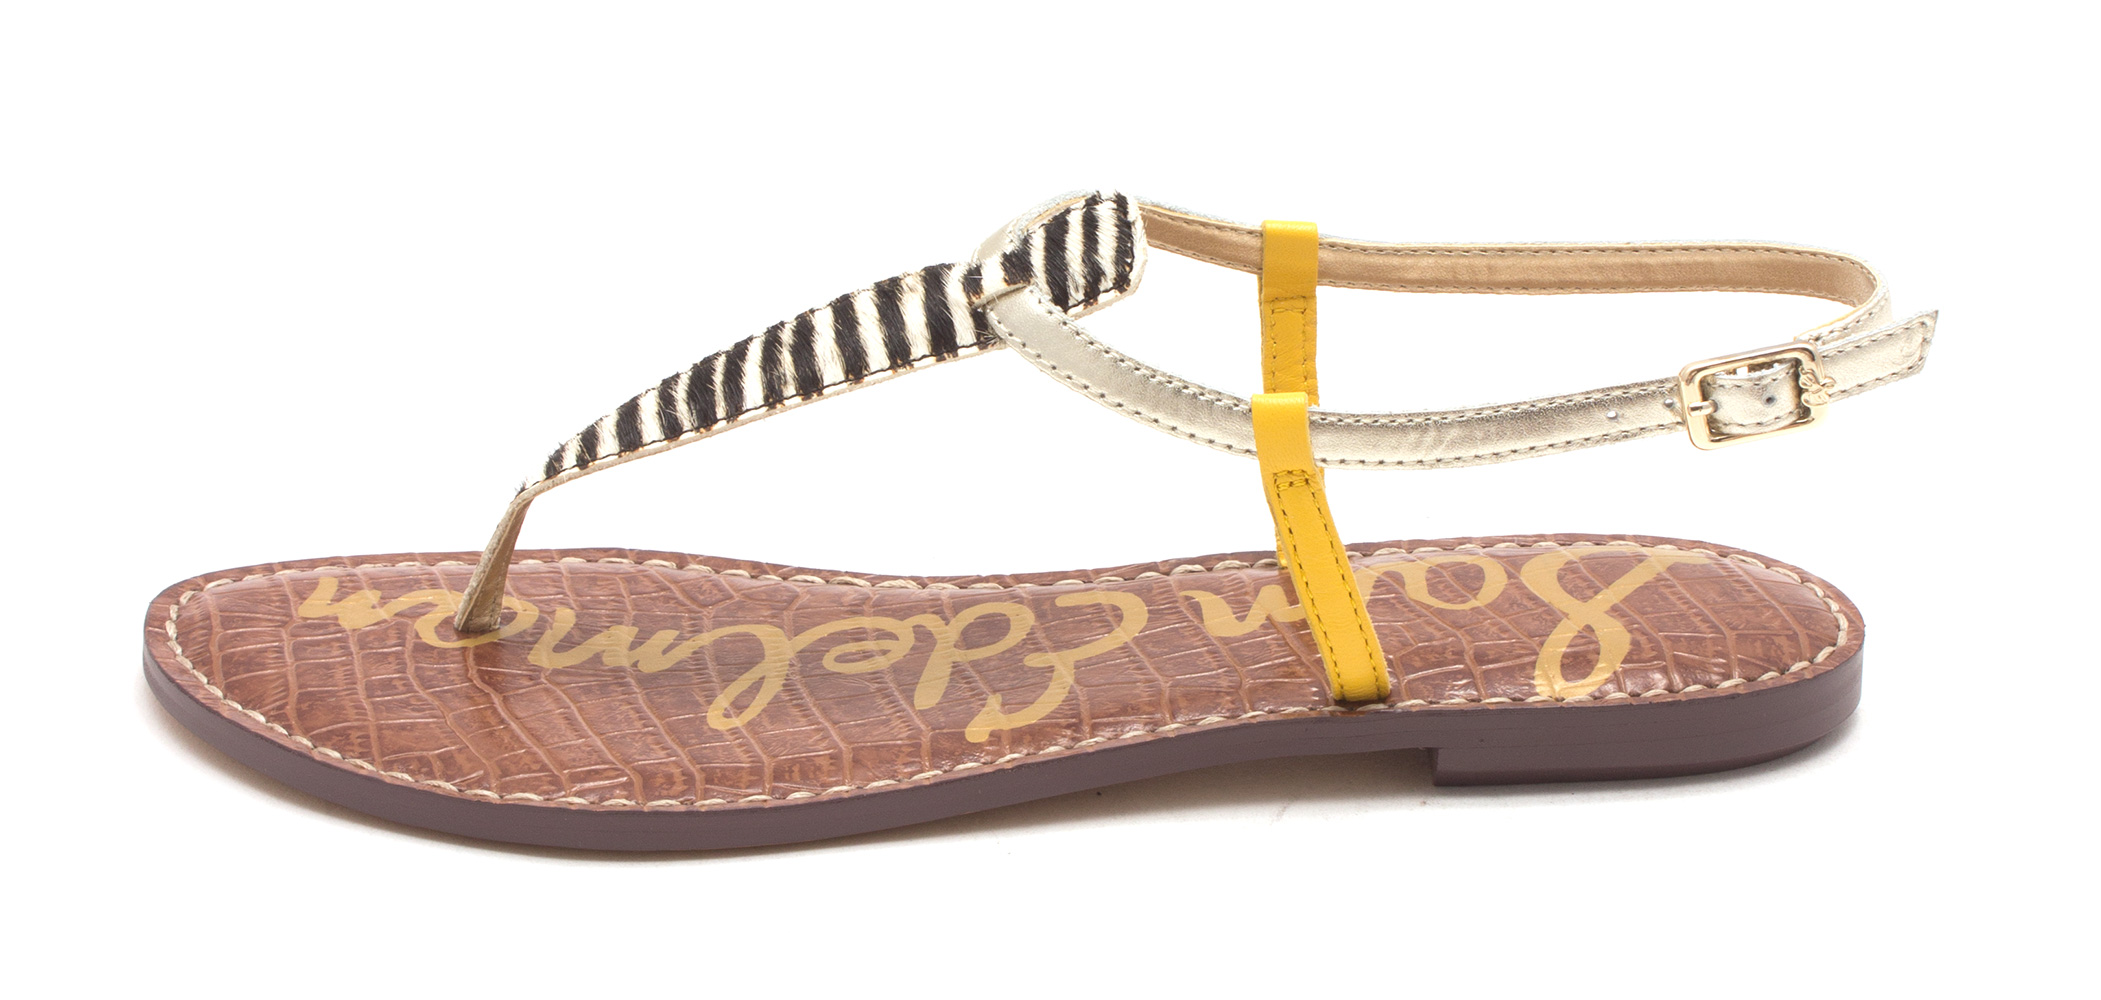 131897a6203dc8 Sam Edelman Womens Gigi Leather Open Toe Casual